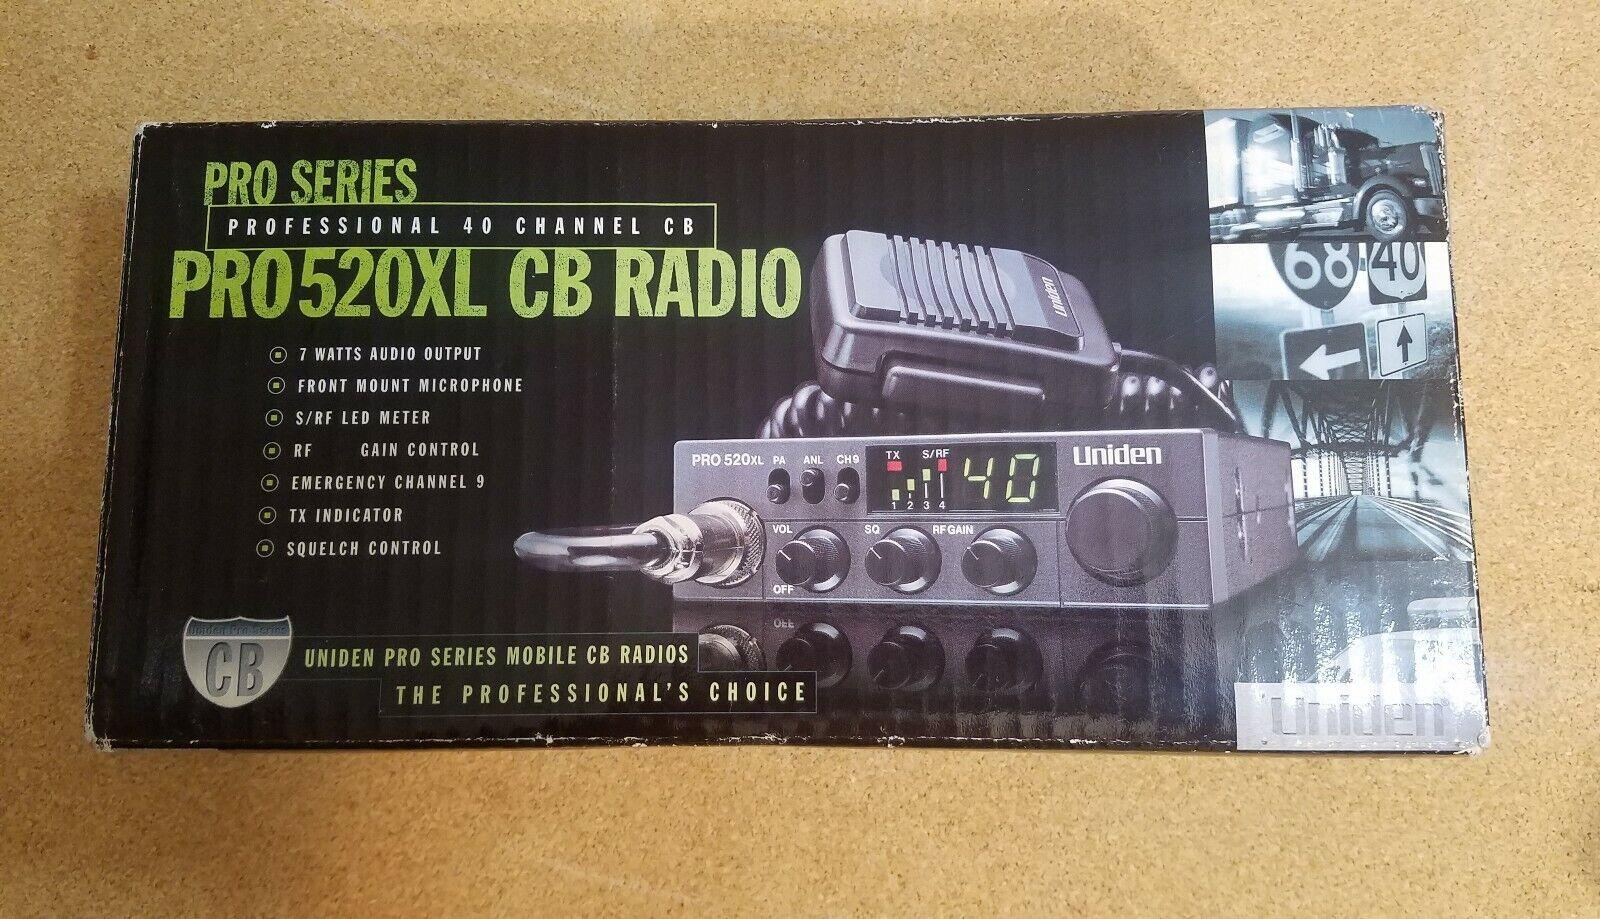 PRO520XL NEW Uniden Pro Series 40-Channel CB Radio, Compact